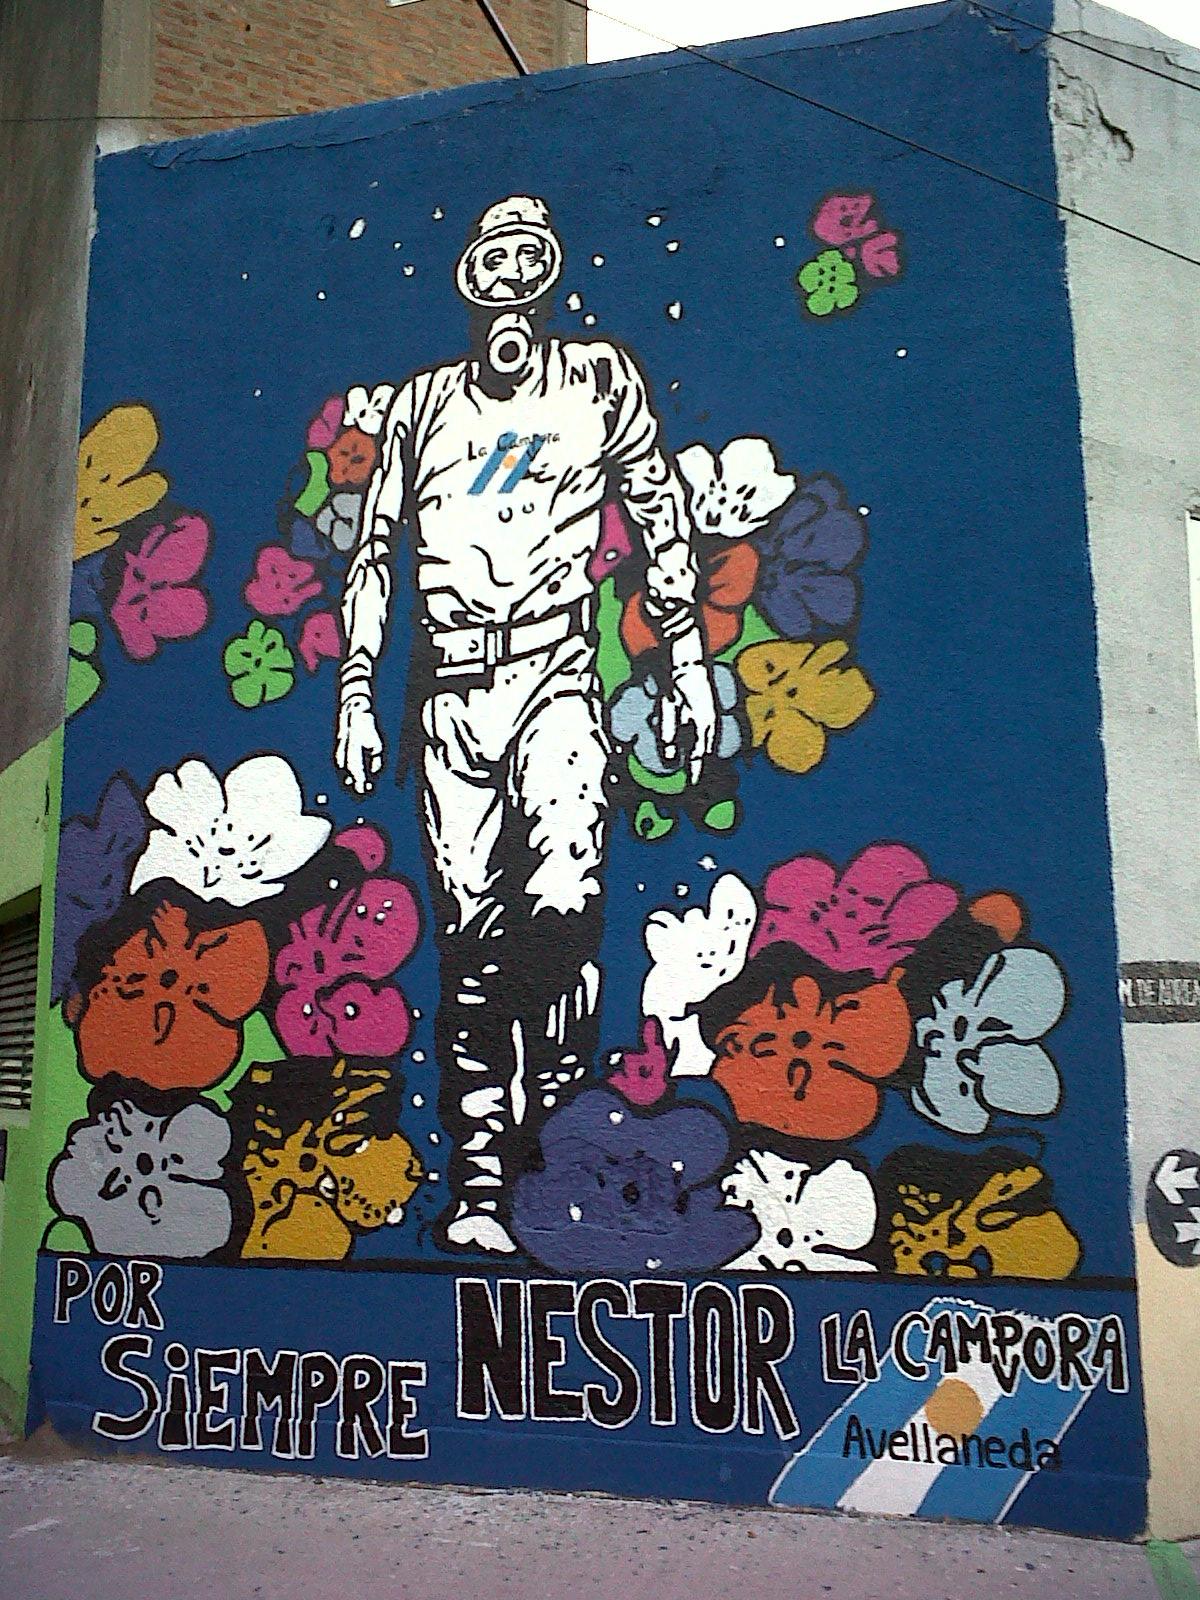 http://1.bp.blogspot.com/-rNNi4r1uybc/T1TYwSTcV_I/AAAAAAAABZU/Dbm6JTHPx1g/s1600/ElNestornauta-Avellaneda.jpg